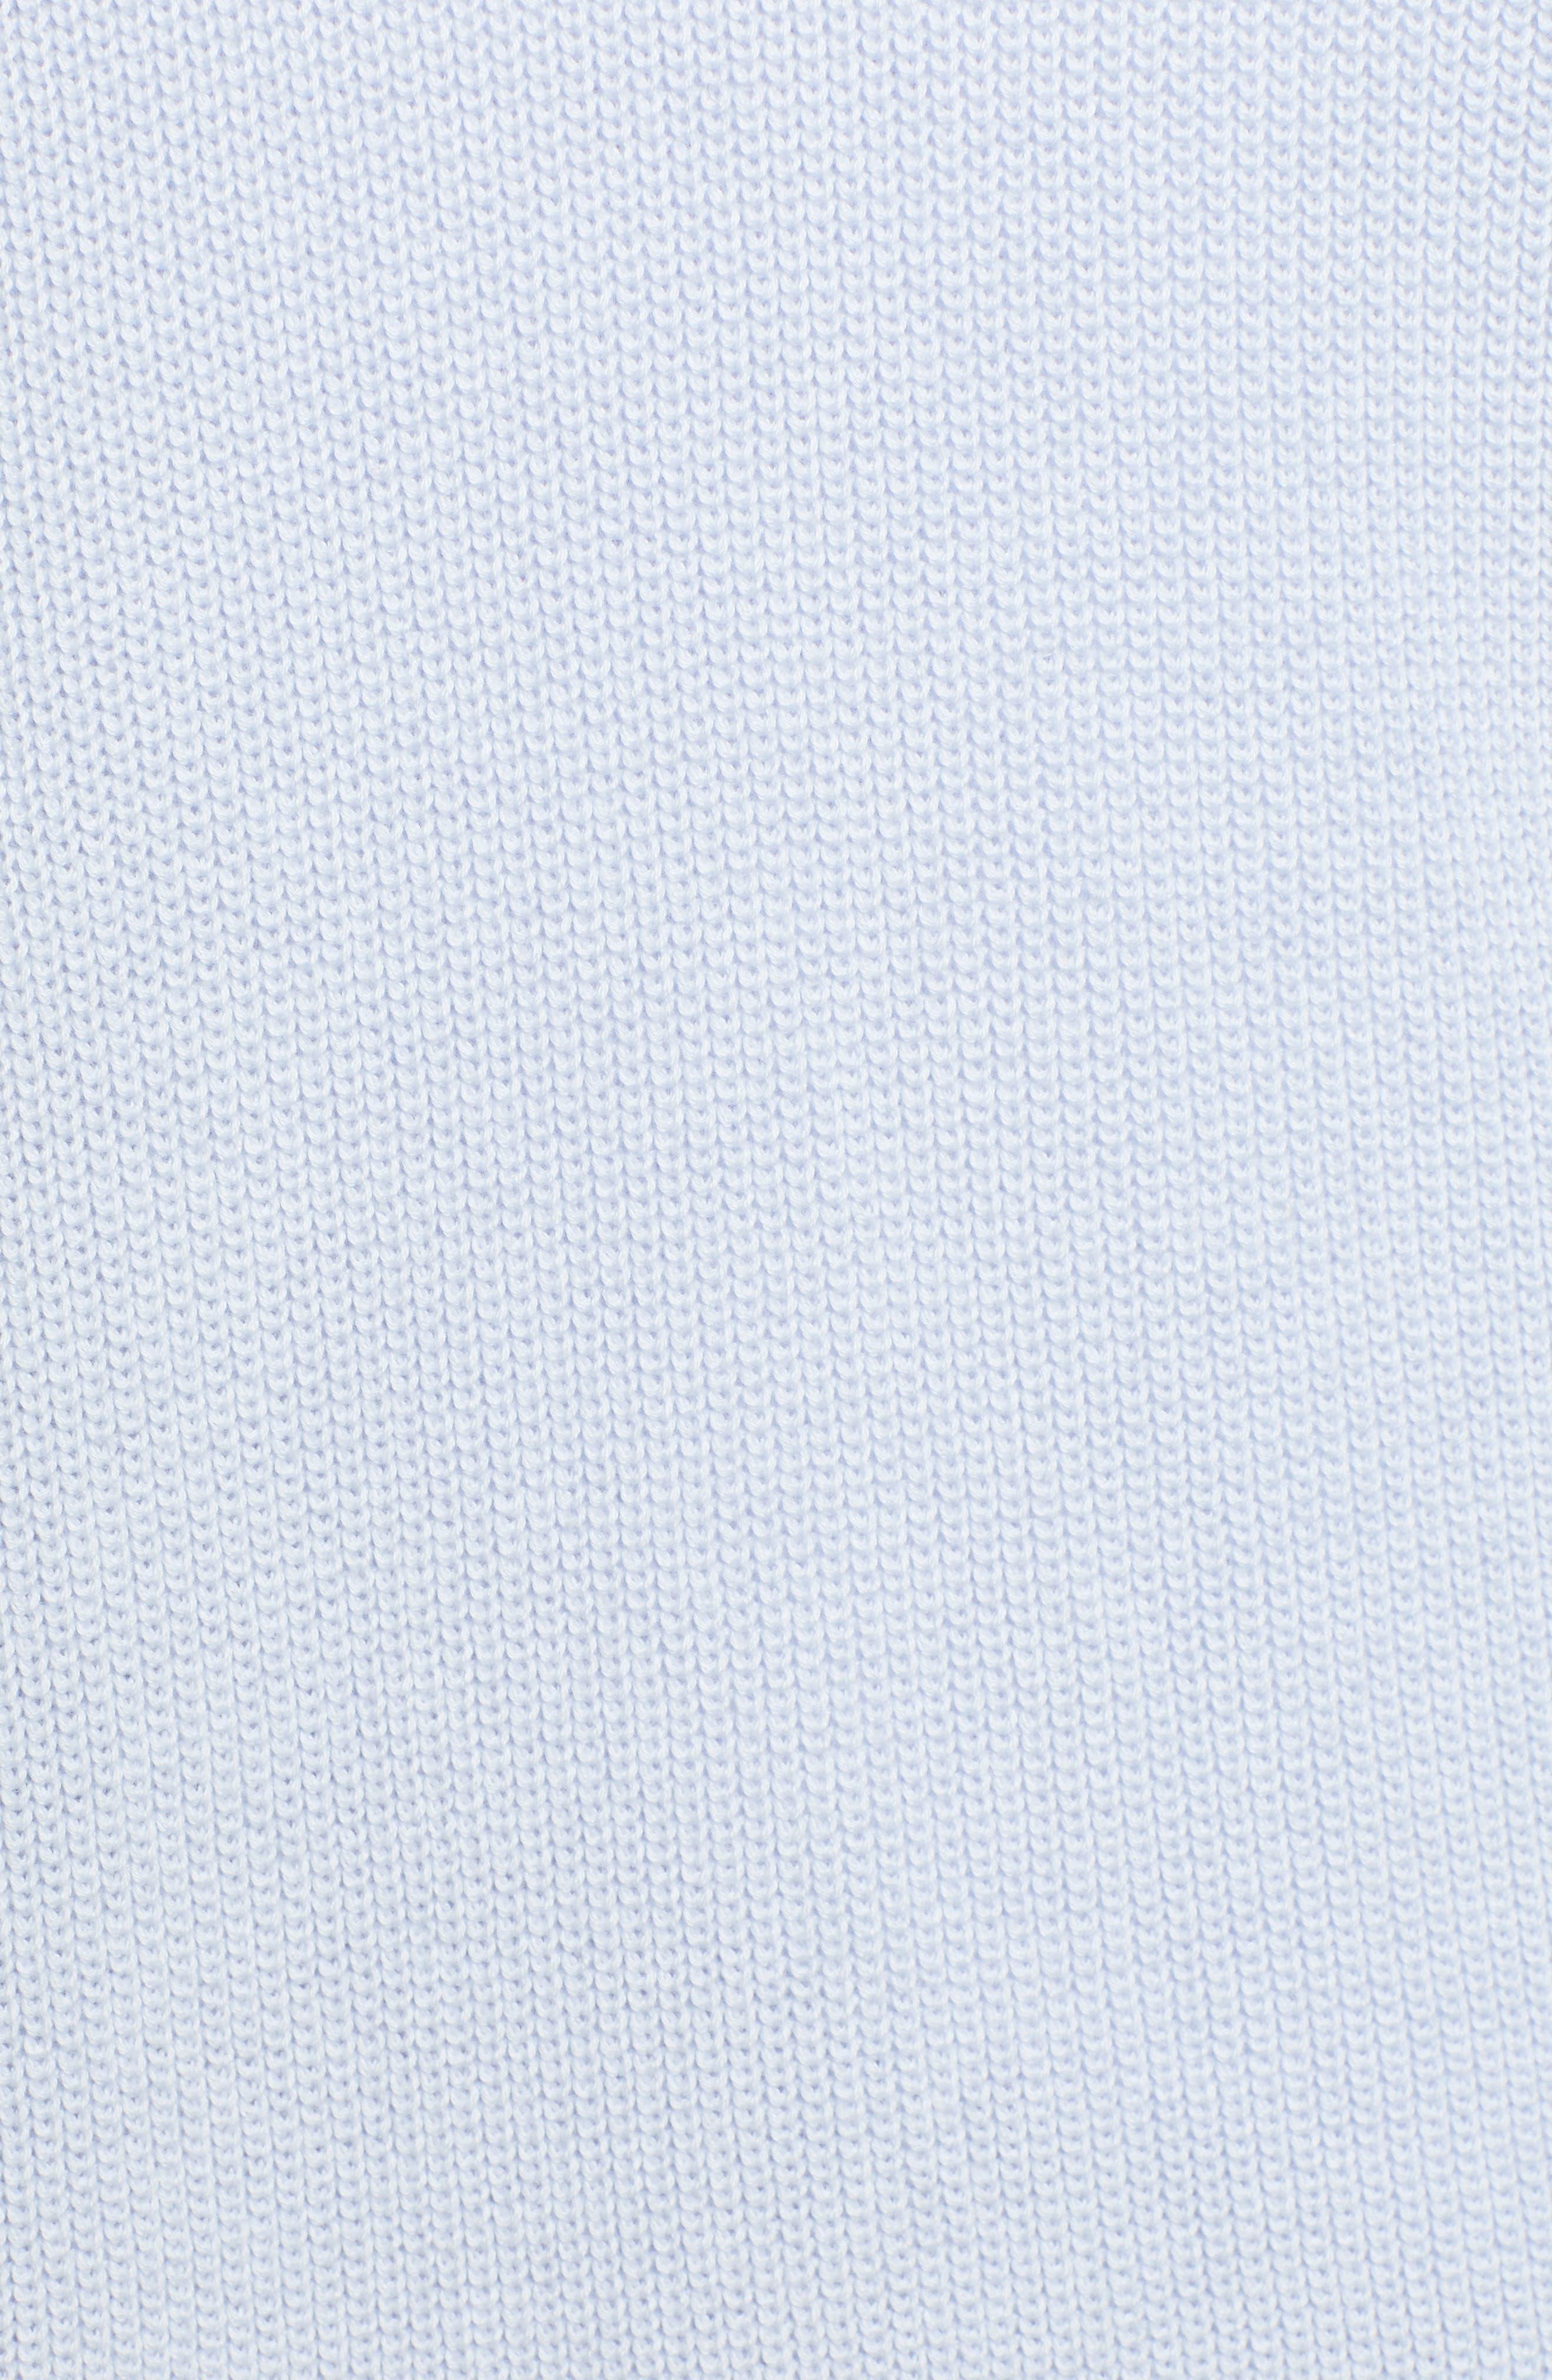 Stitch Curve Hem Cardigan,                             Alternate thumbnail 7, color,                             BLUE FEATHER